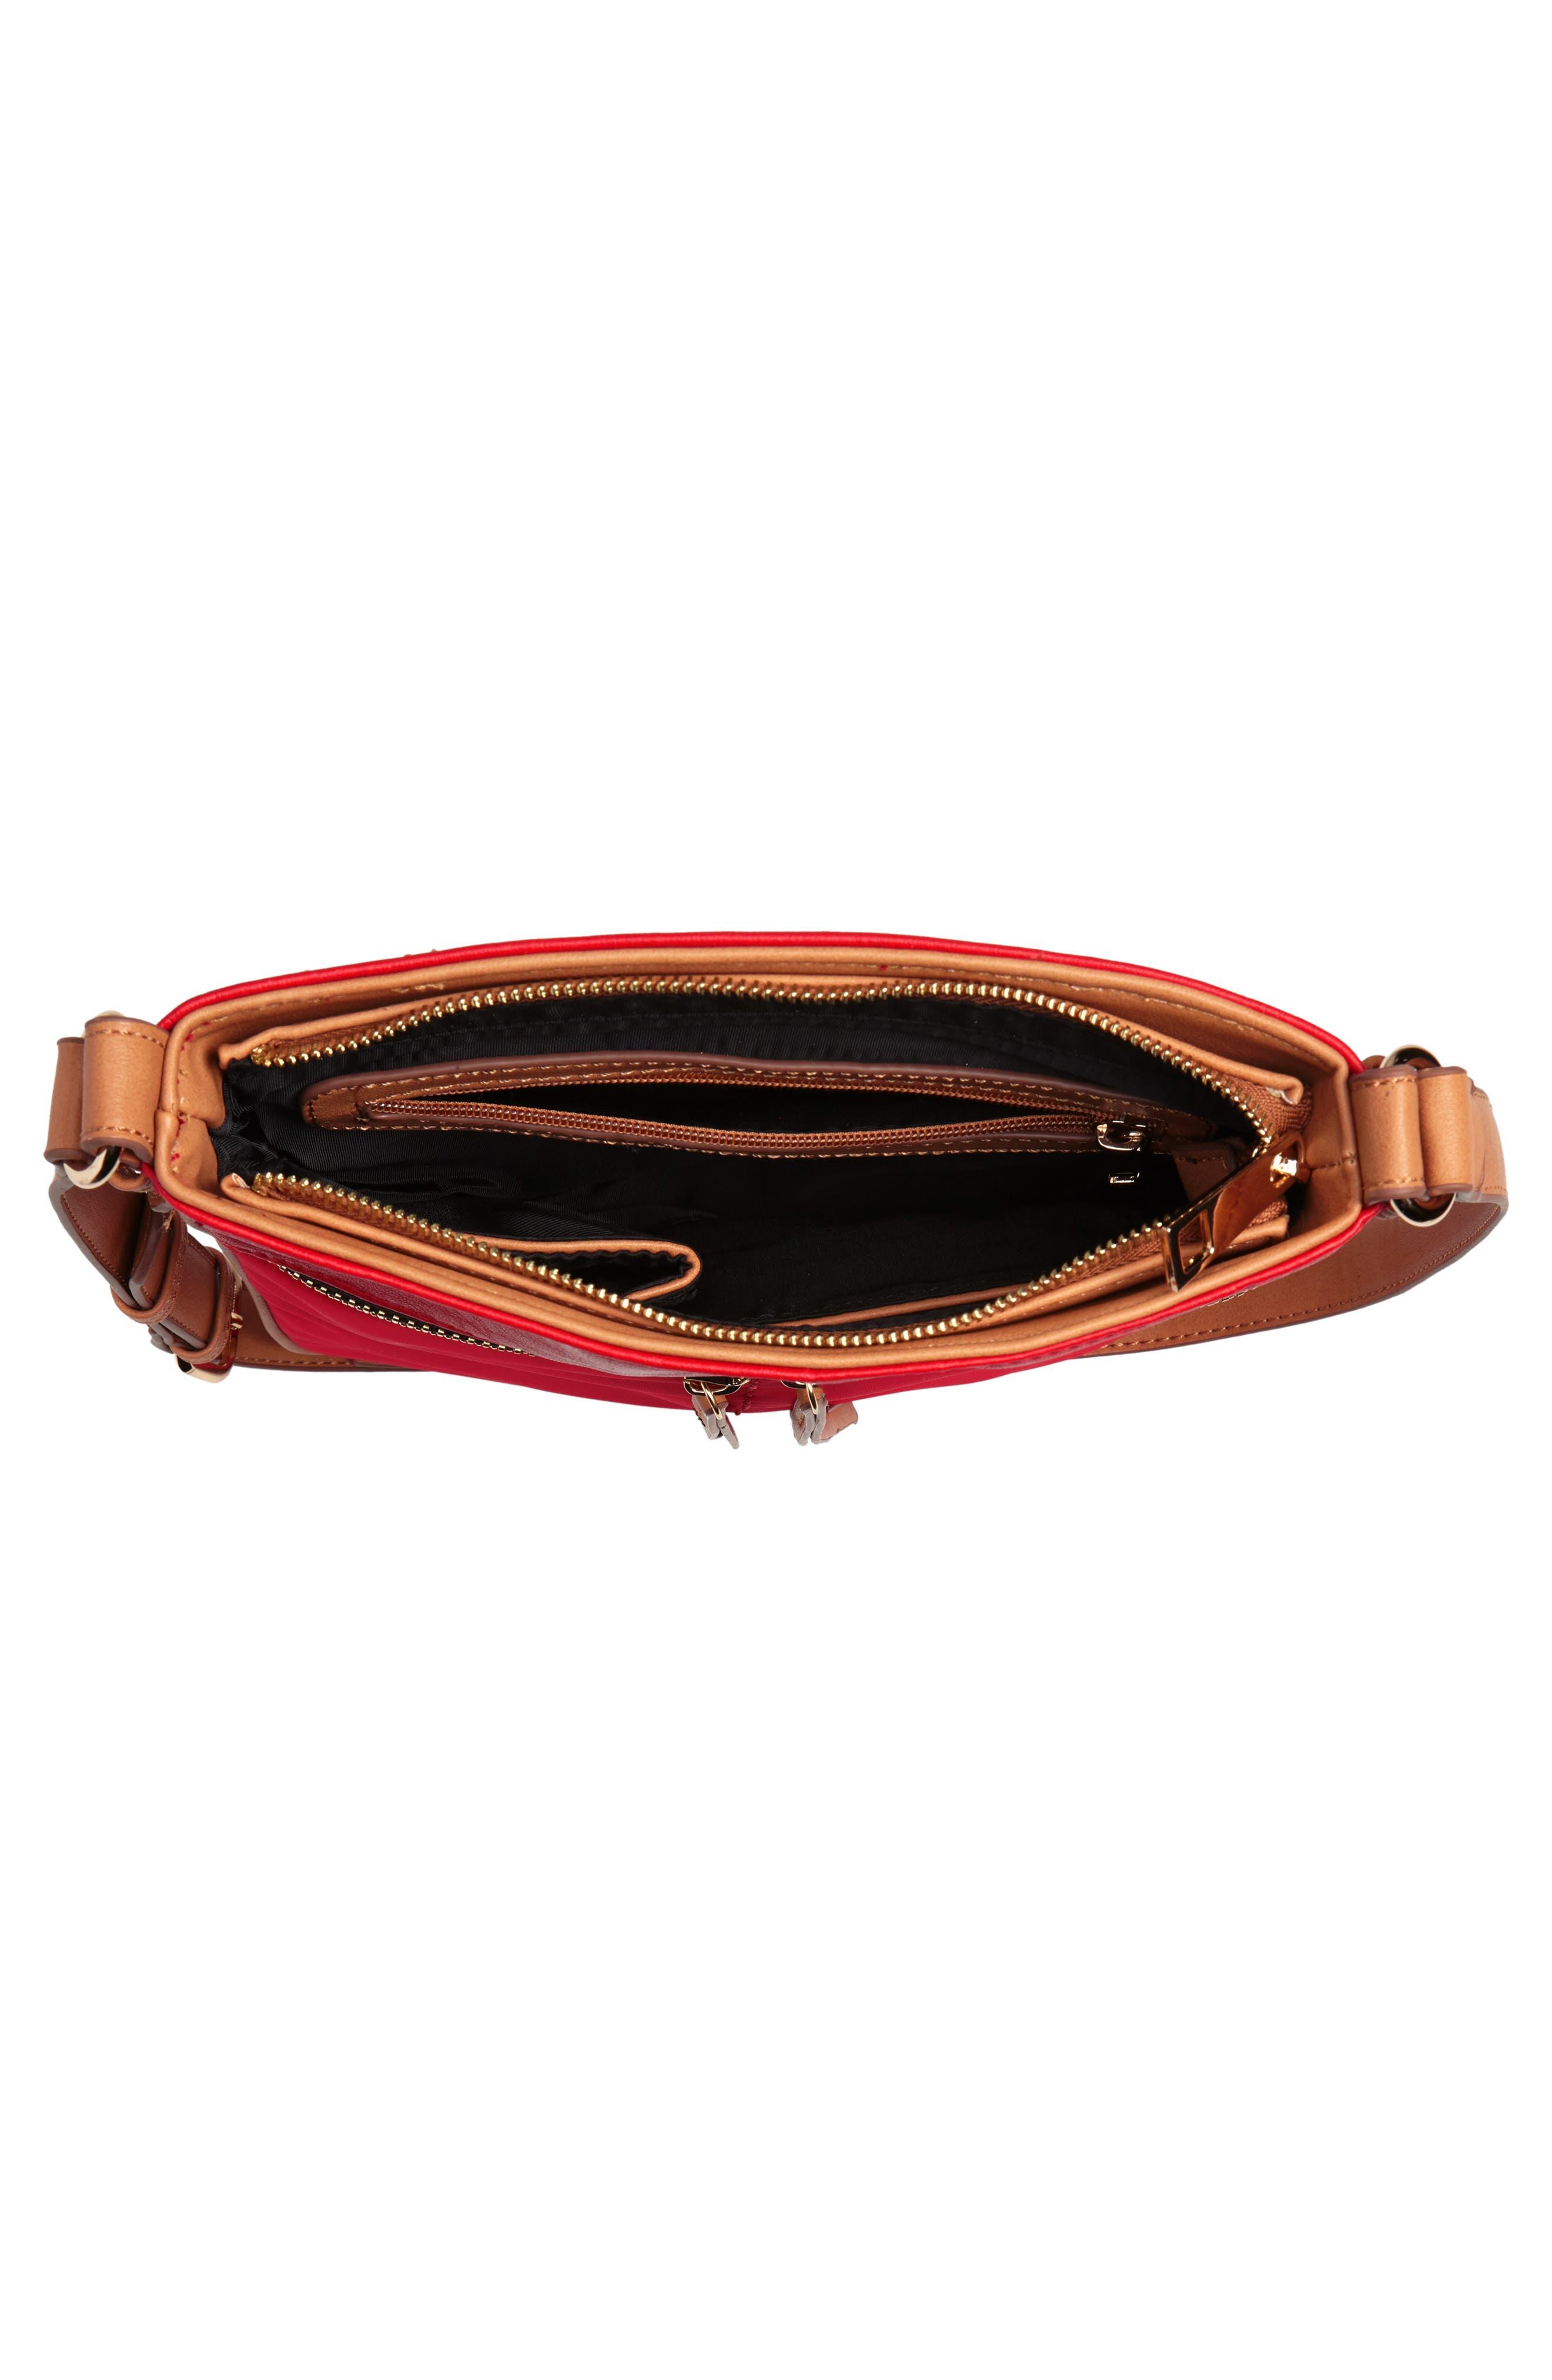 Nylon & Faux Leather Crossbody Bag,                             Alternate thumbnail 4, color,                             600